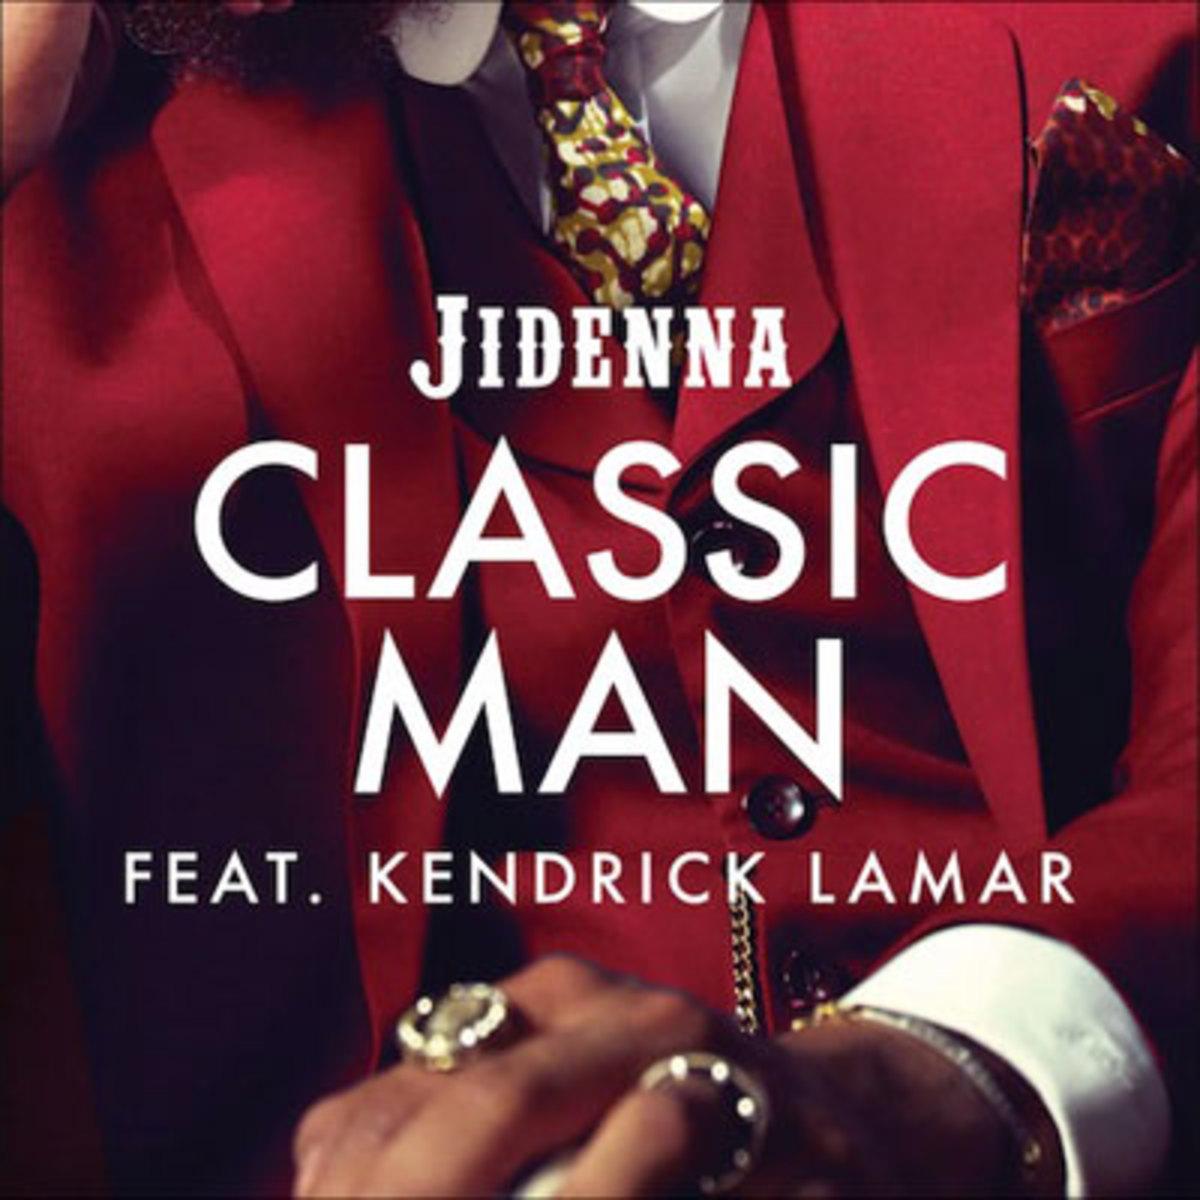 jidenna-classic-man-remix.jpg